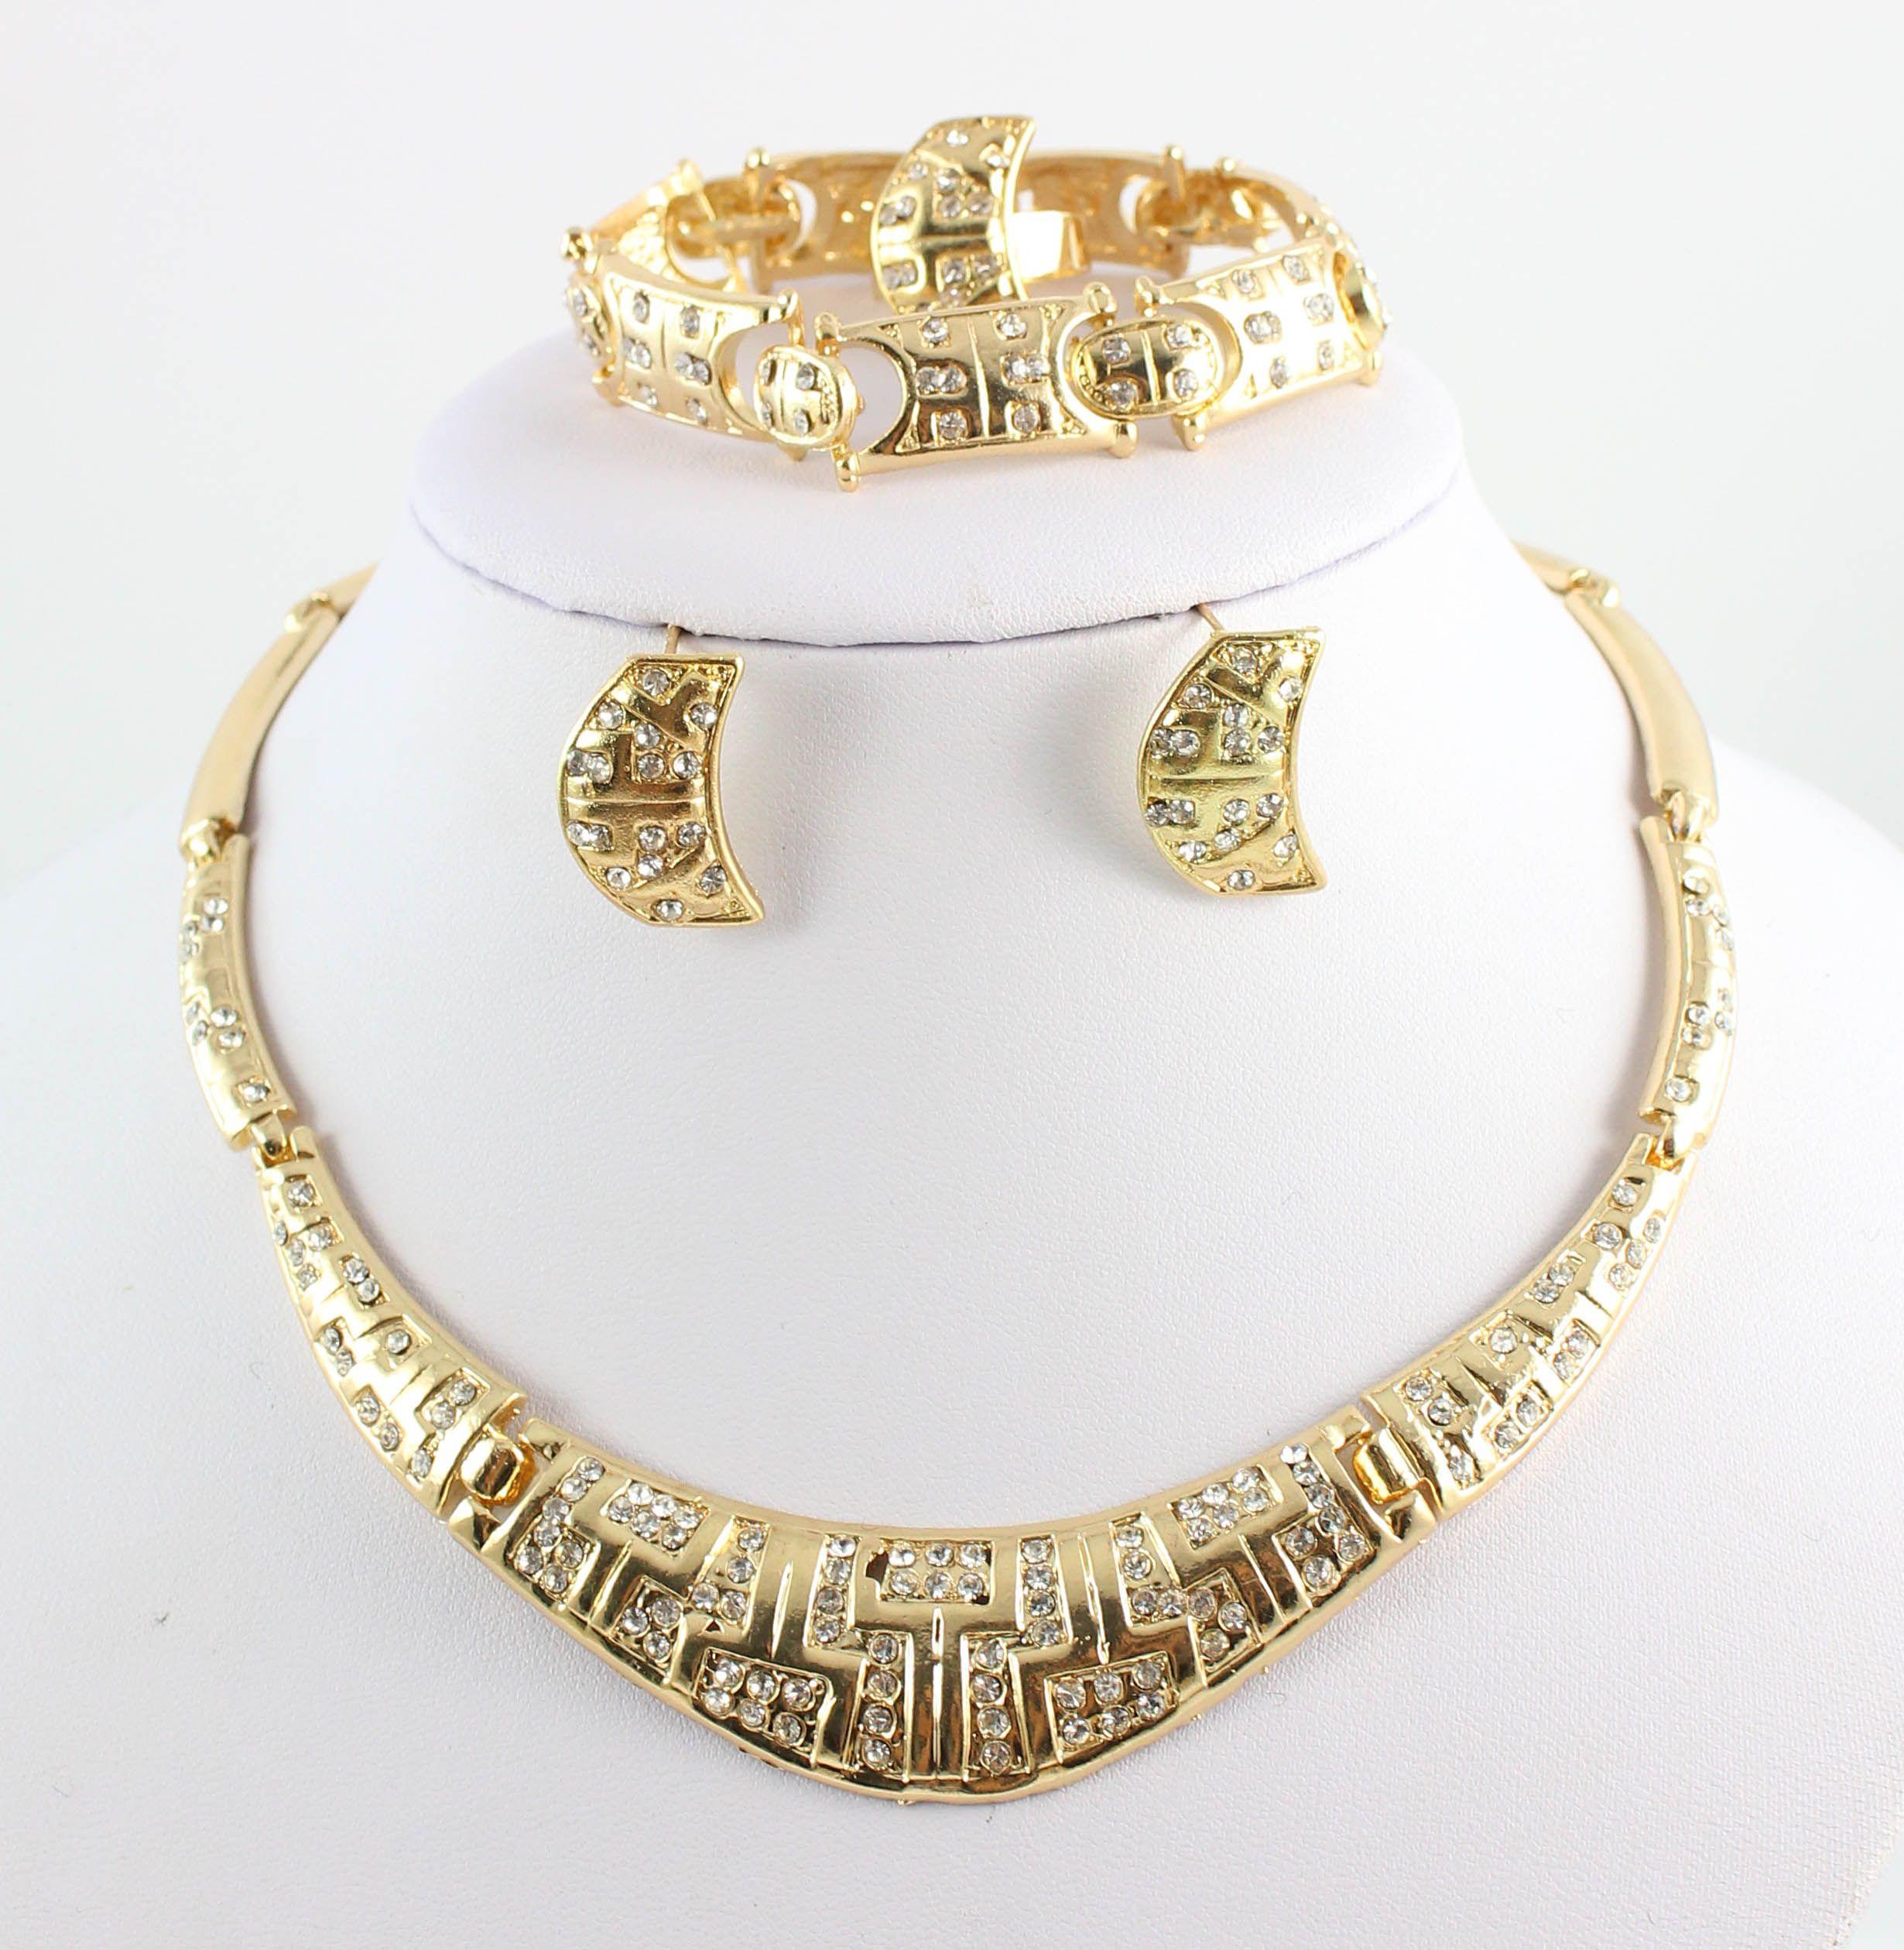 New Charming Lady 18k Gold Plated Jewelry Elegant Fashion Bridal Wedding Dress Accessories